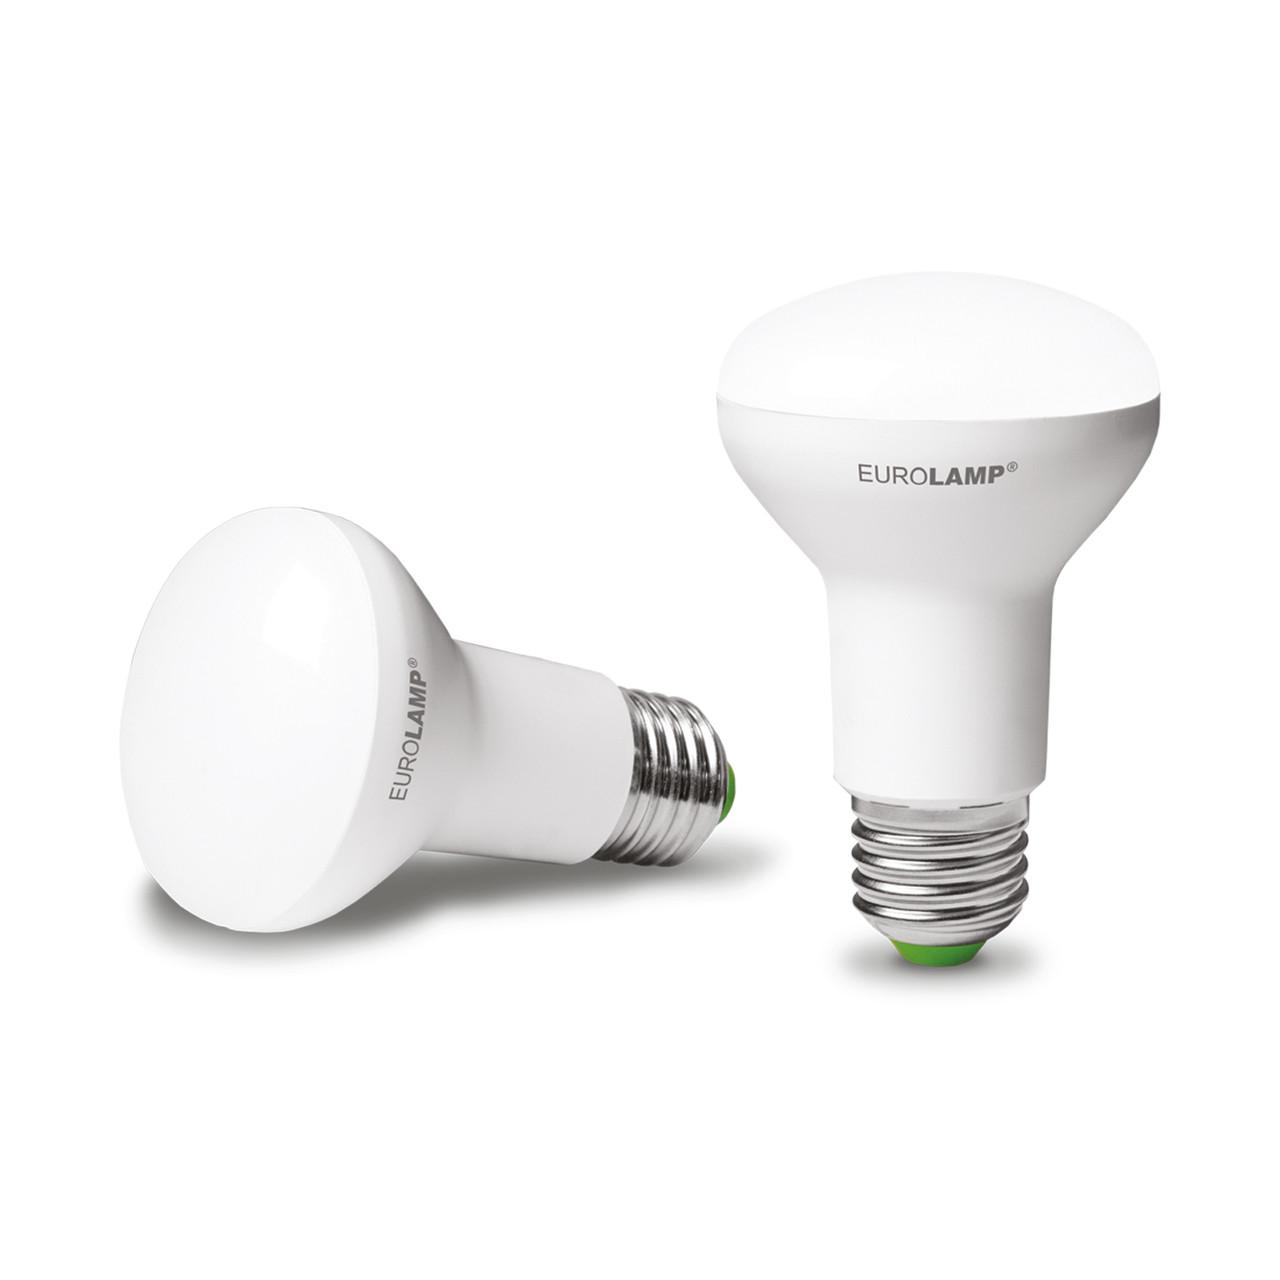 EUROLAMP LED Лампа ЕКО R63 9W E27 3000K